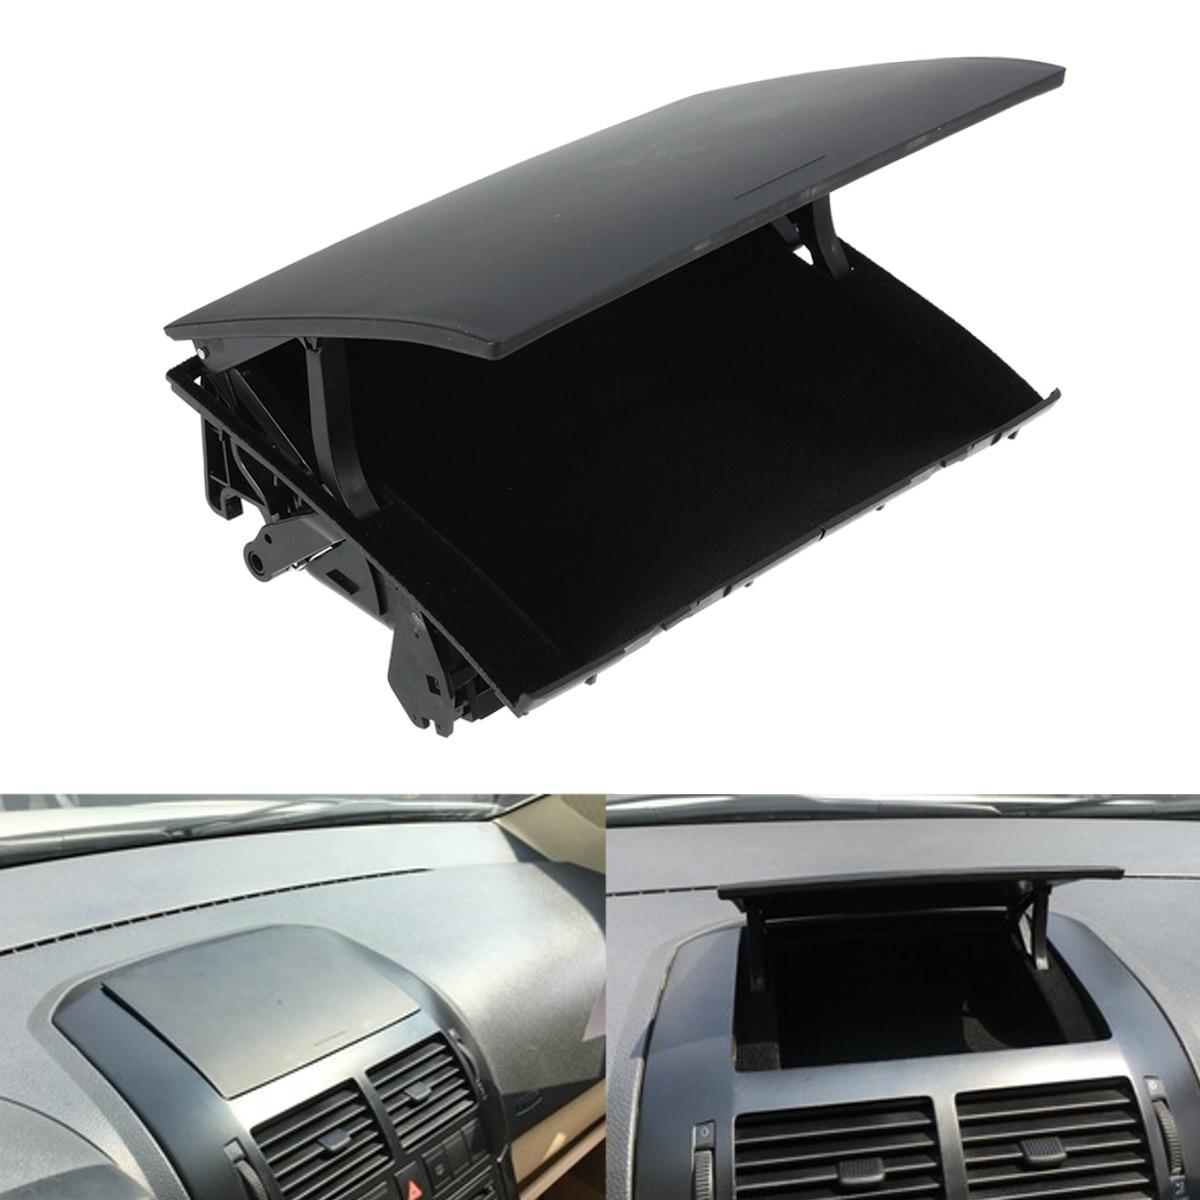 Black Car Front Center Console Dashboard Storage Box Holder Organizer For VW Polo 2002 2003 2004 2005-2008 6Q0857465A 6Q0857465Black Car Front Center Console Dashboard Storage Box Holder Organizer For VW Polo 2002 2003 2004 2005-2008 6Q0857465A 6Q0857465